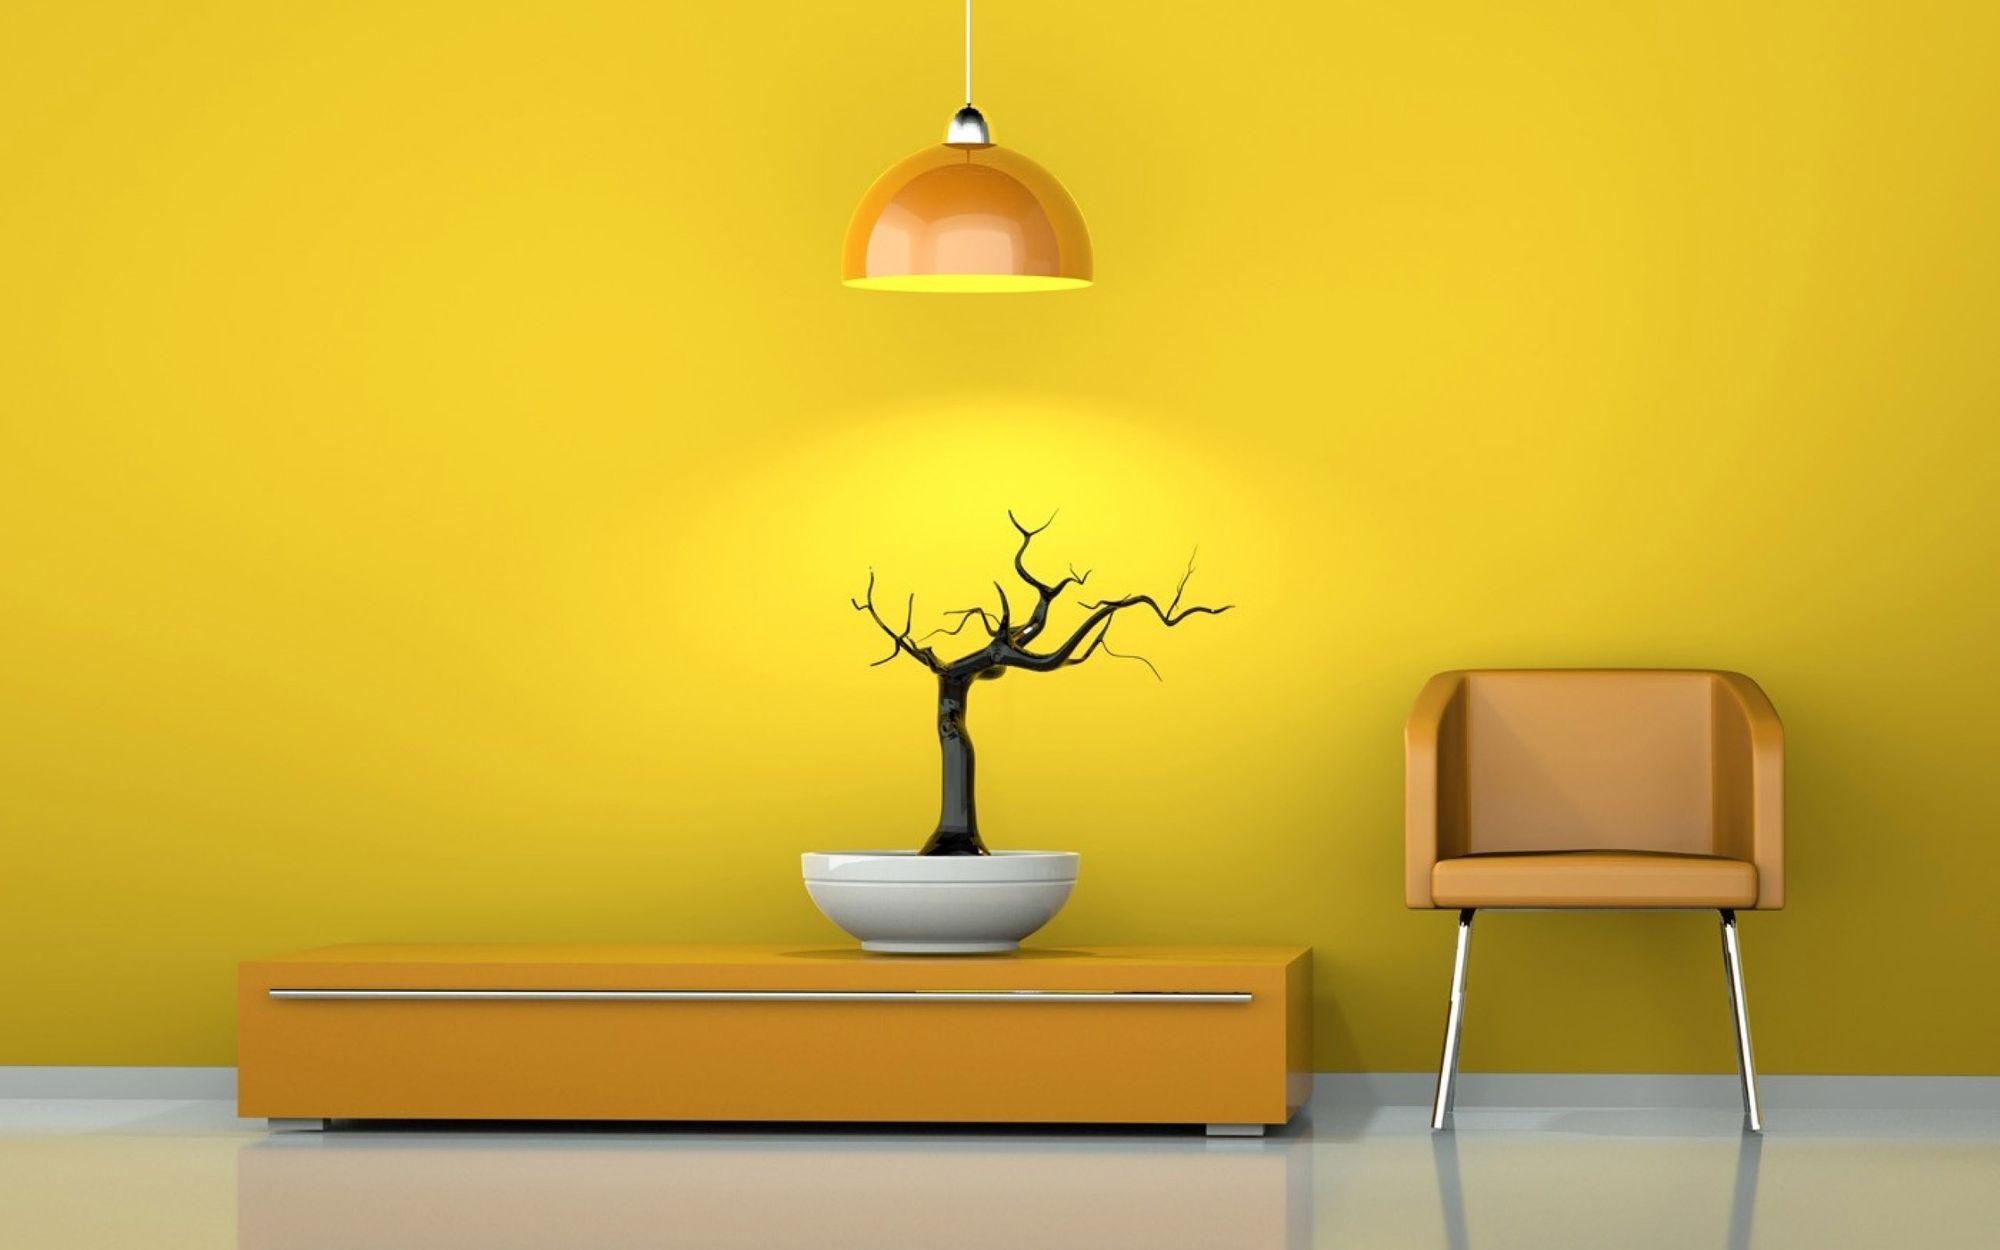 pengaruh warna pada psikologis - efek psikologis warna kuning